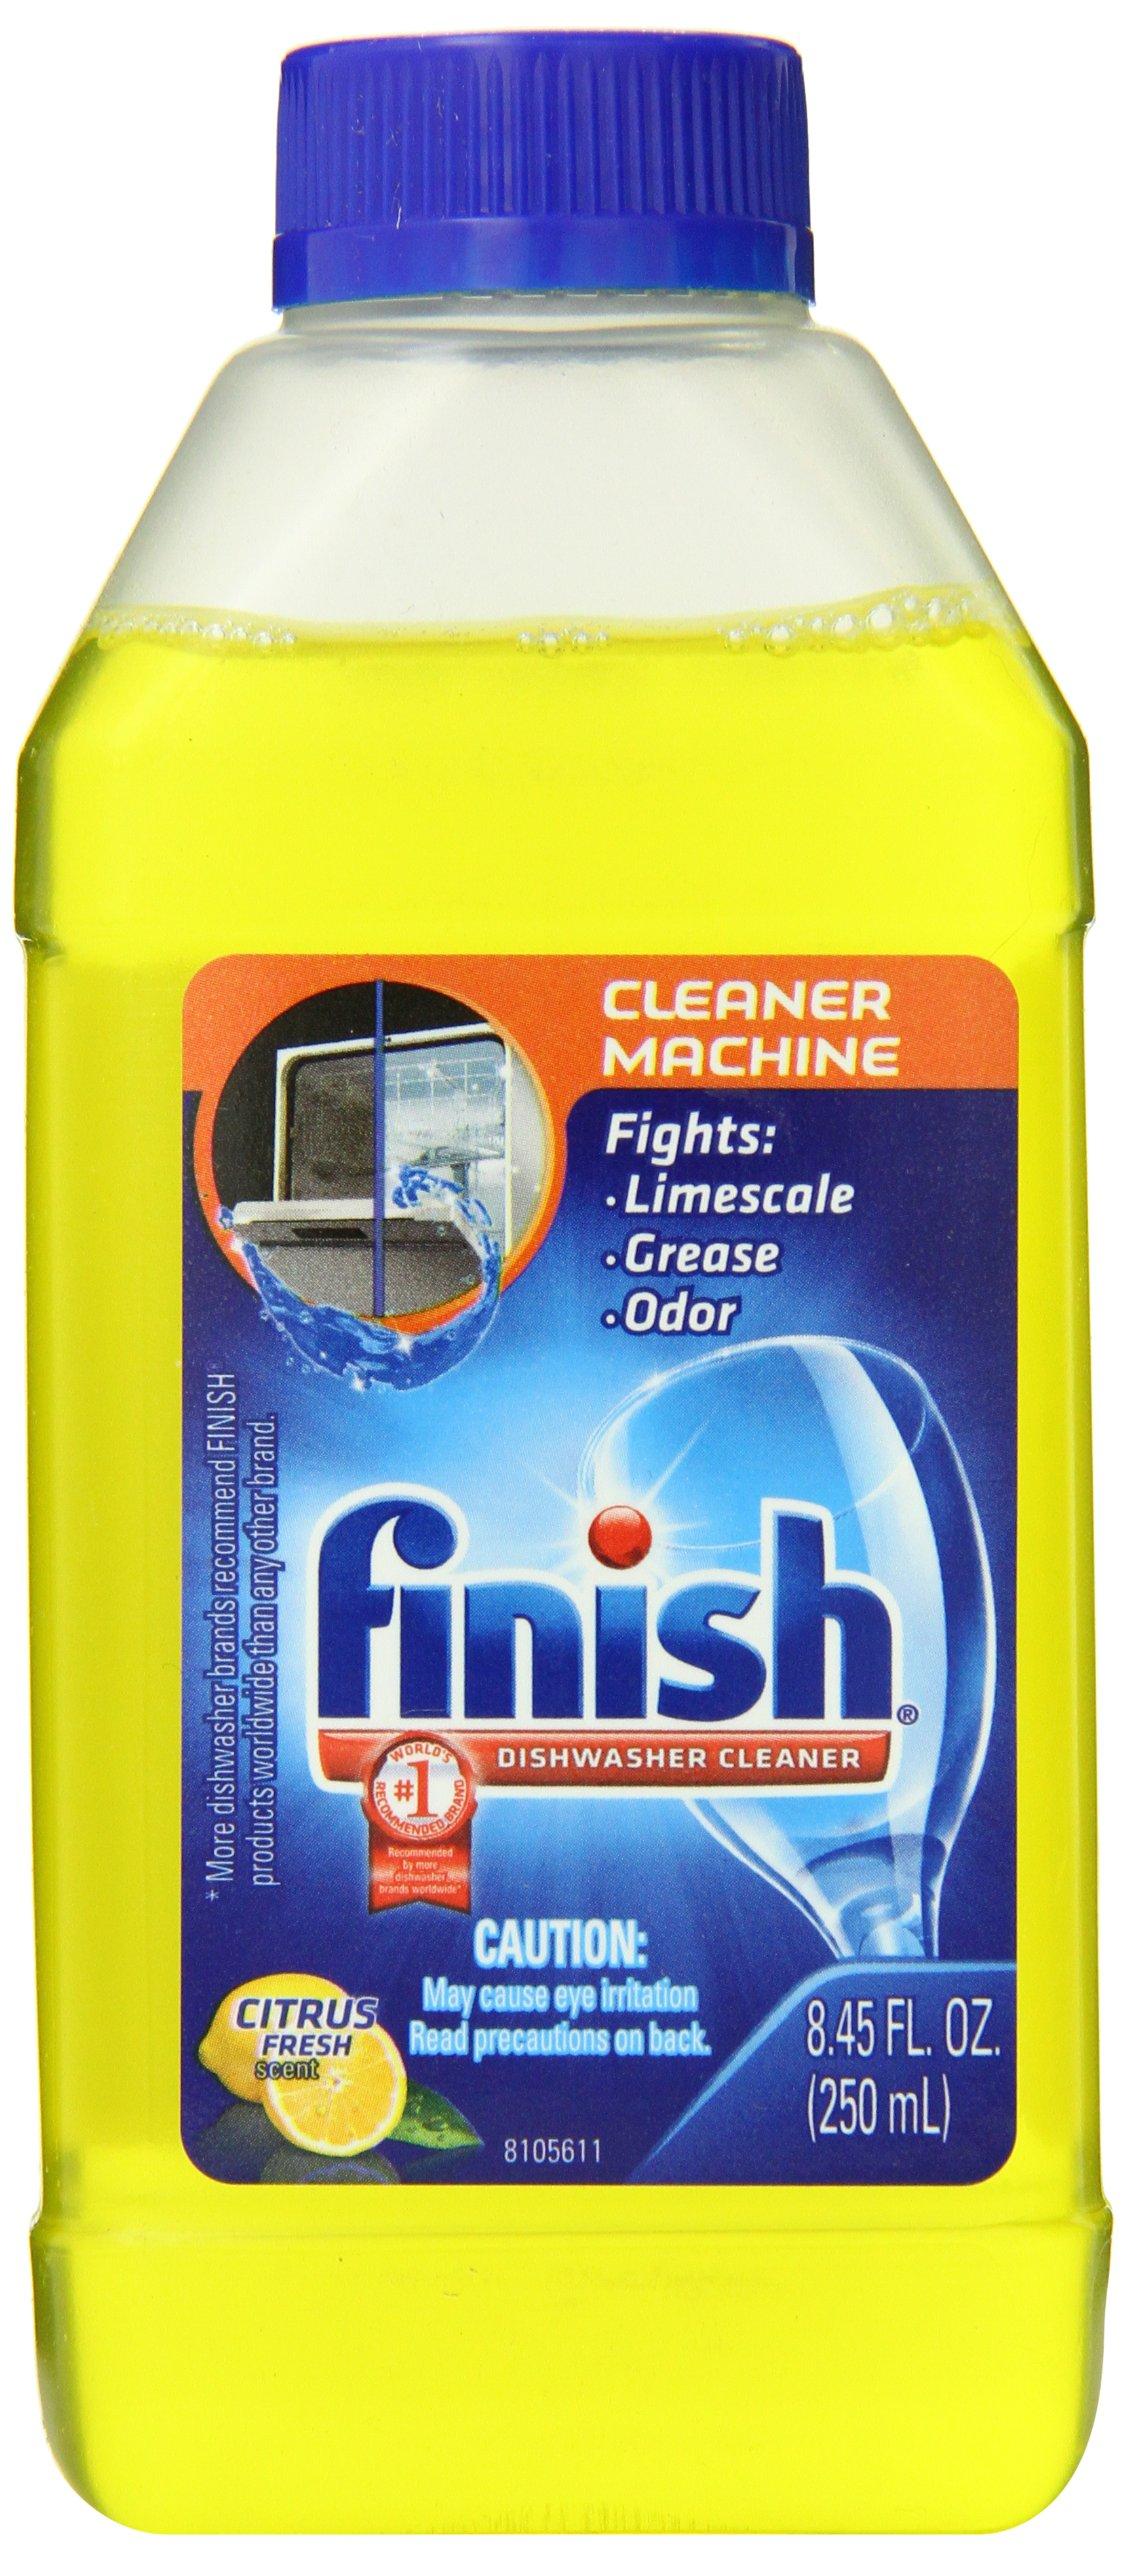 Finish Dishwasher Machine Cleaner, 8.45 oz, Citrus Fresh